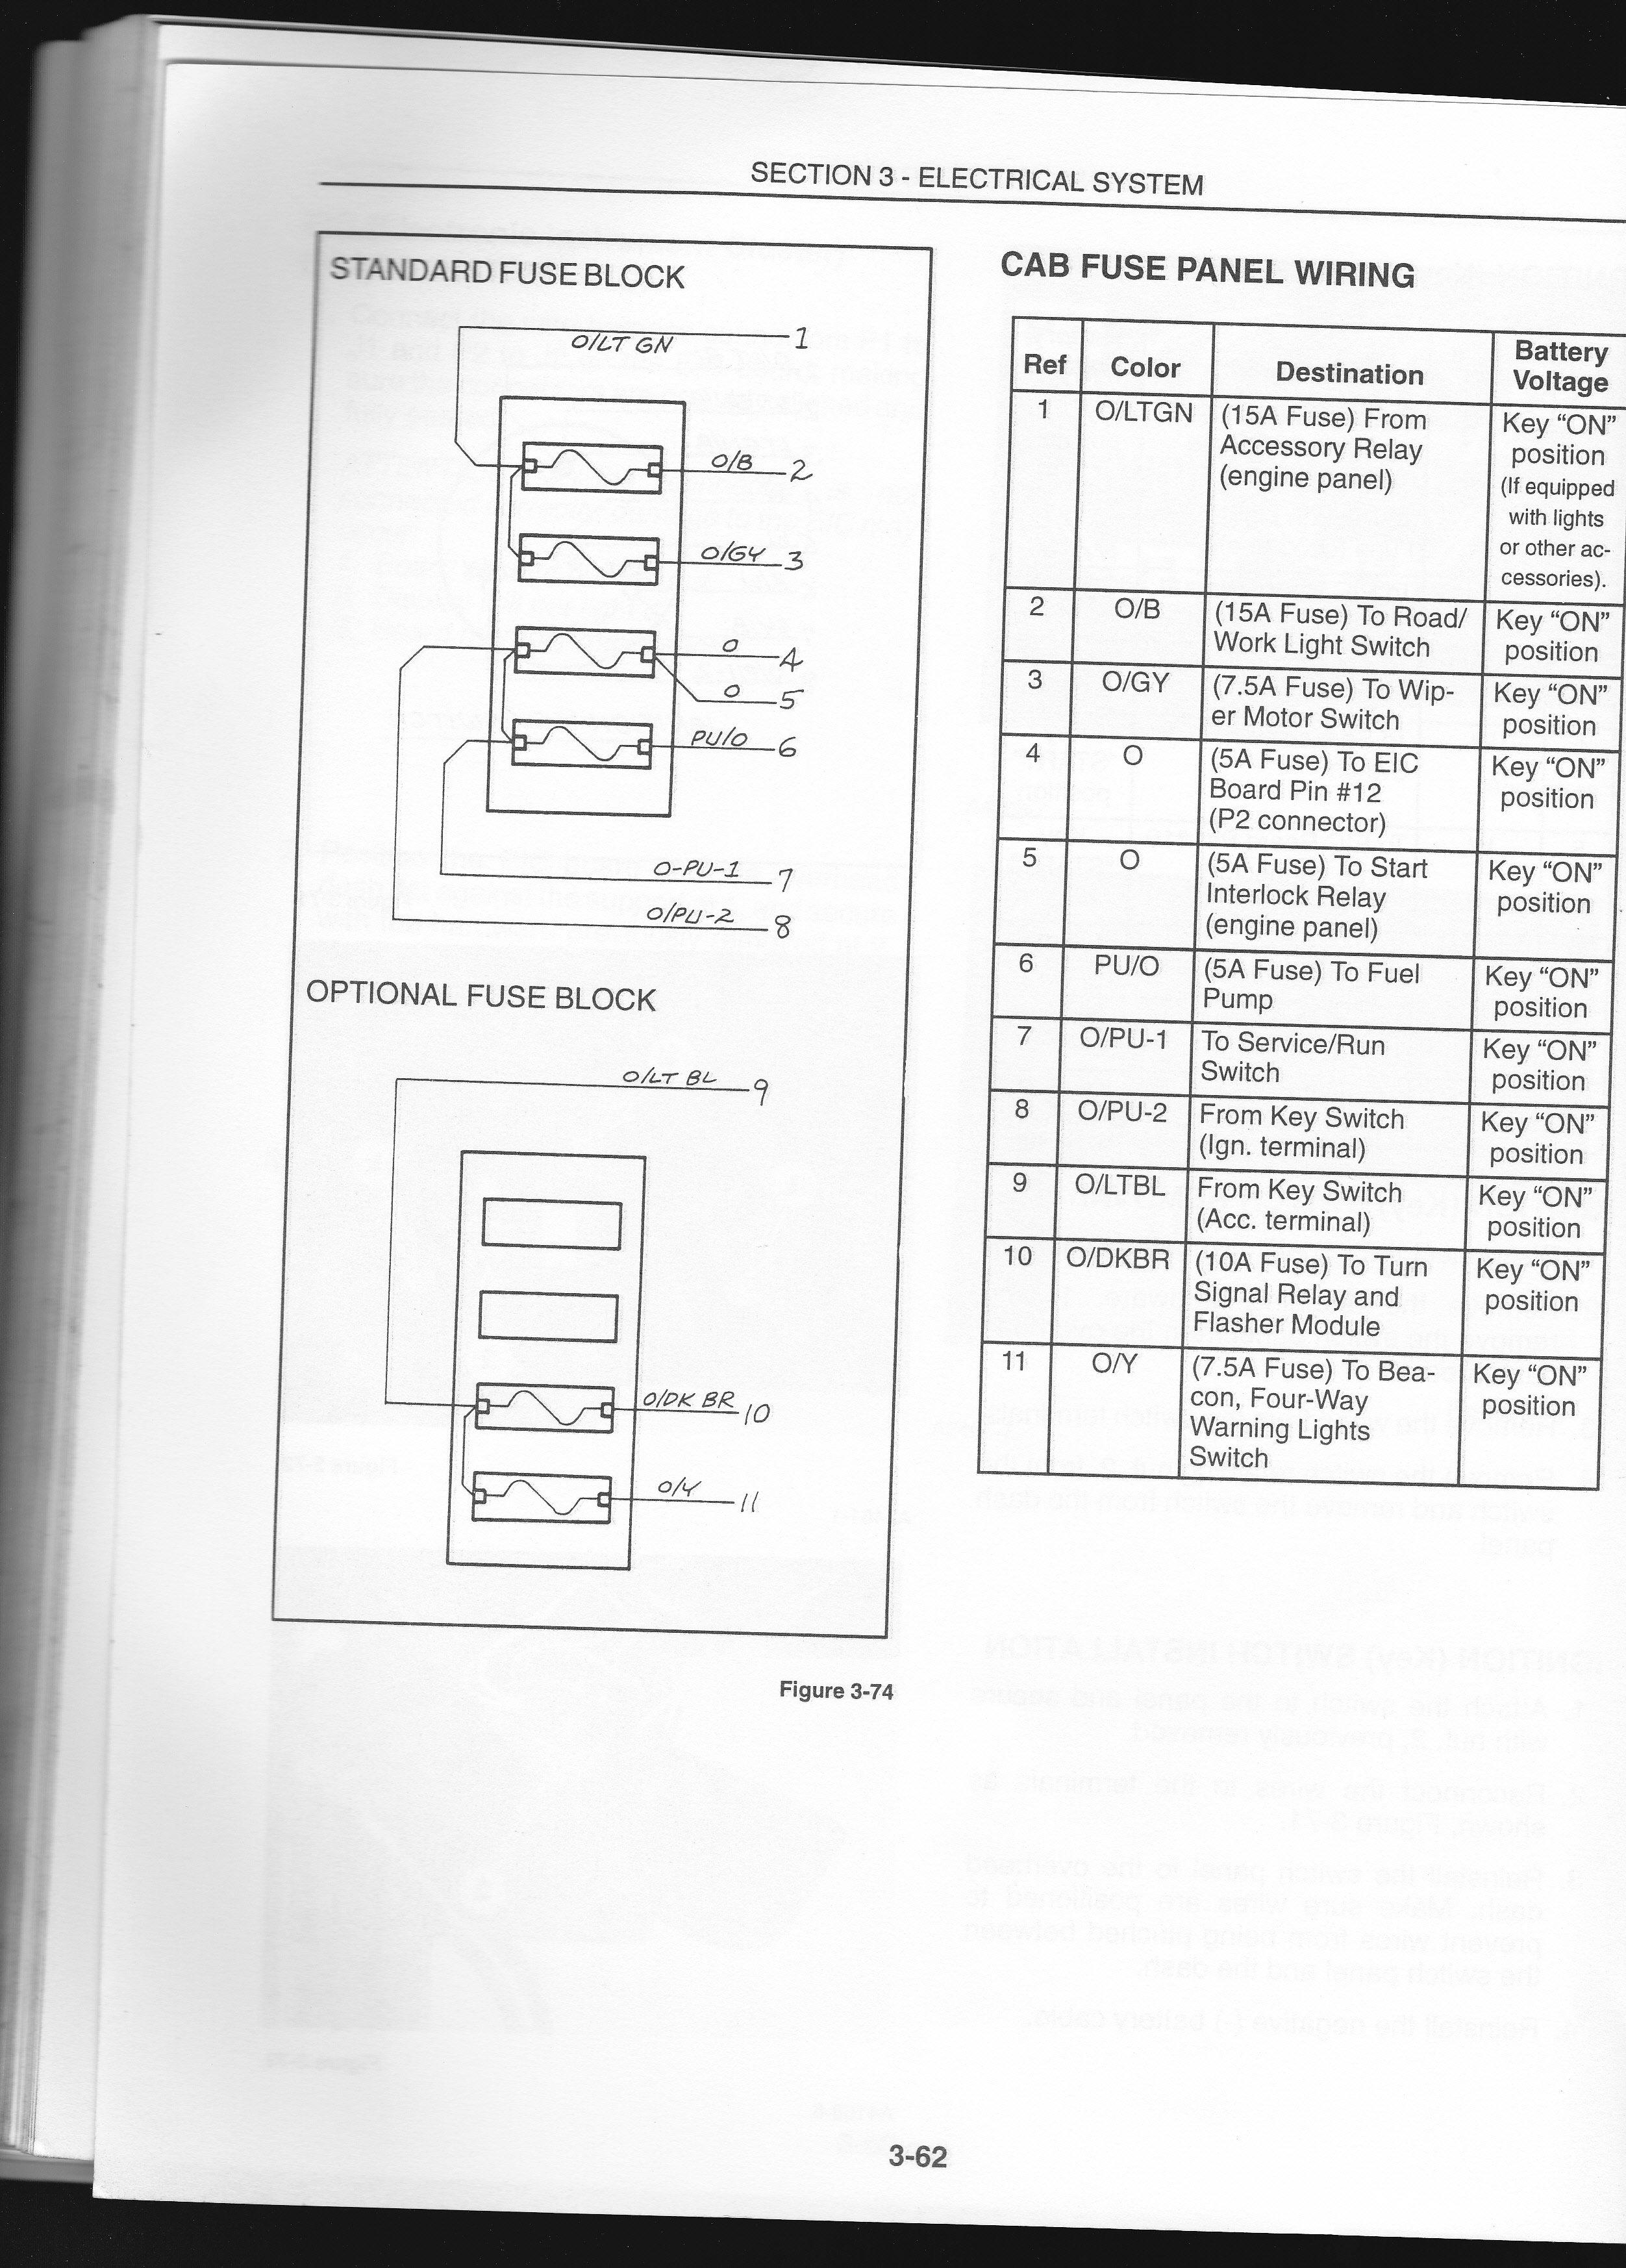 Lx865 Wiring Diagram Circuits Symbols Diagrams Kohler Key Switch Wire 4 Smart Auto Electrical U2022 Rh 6weeks Co Uk